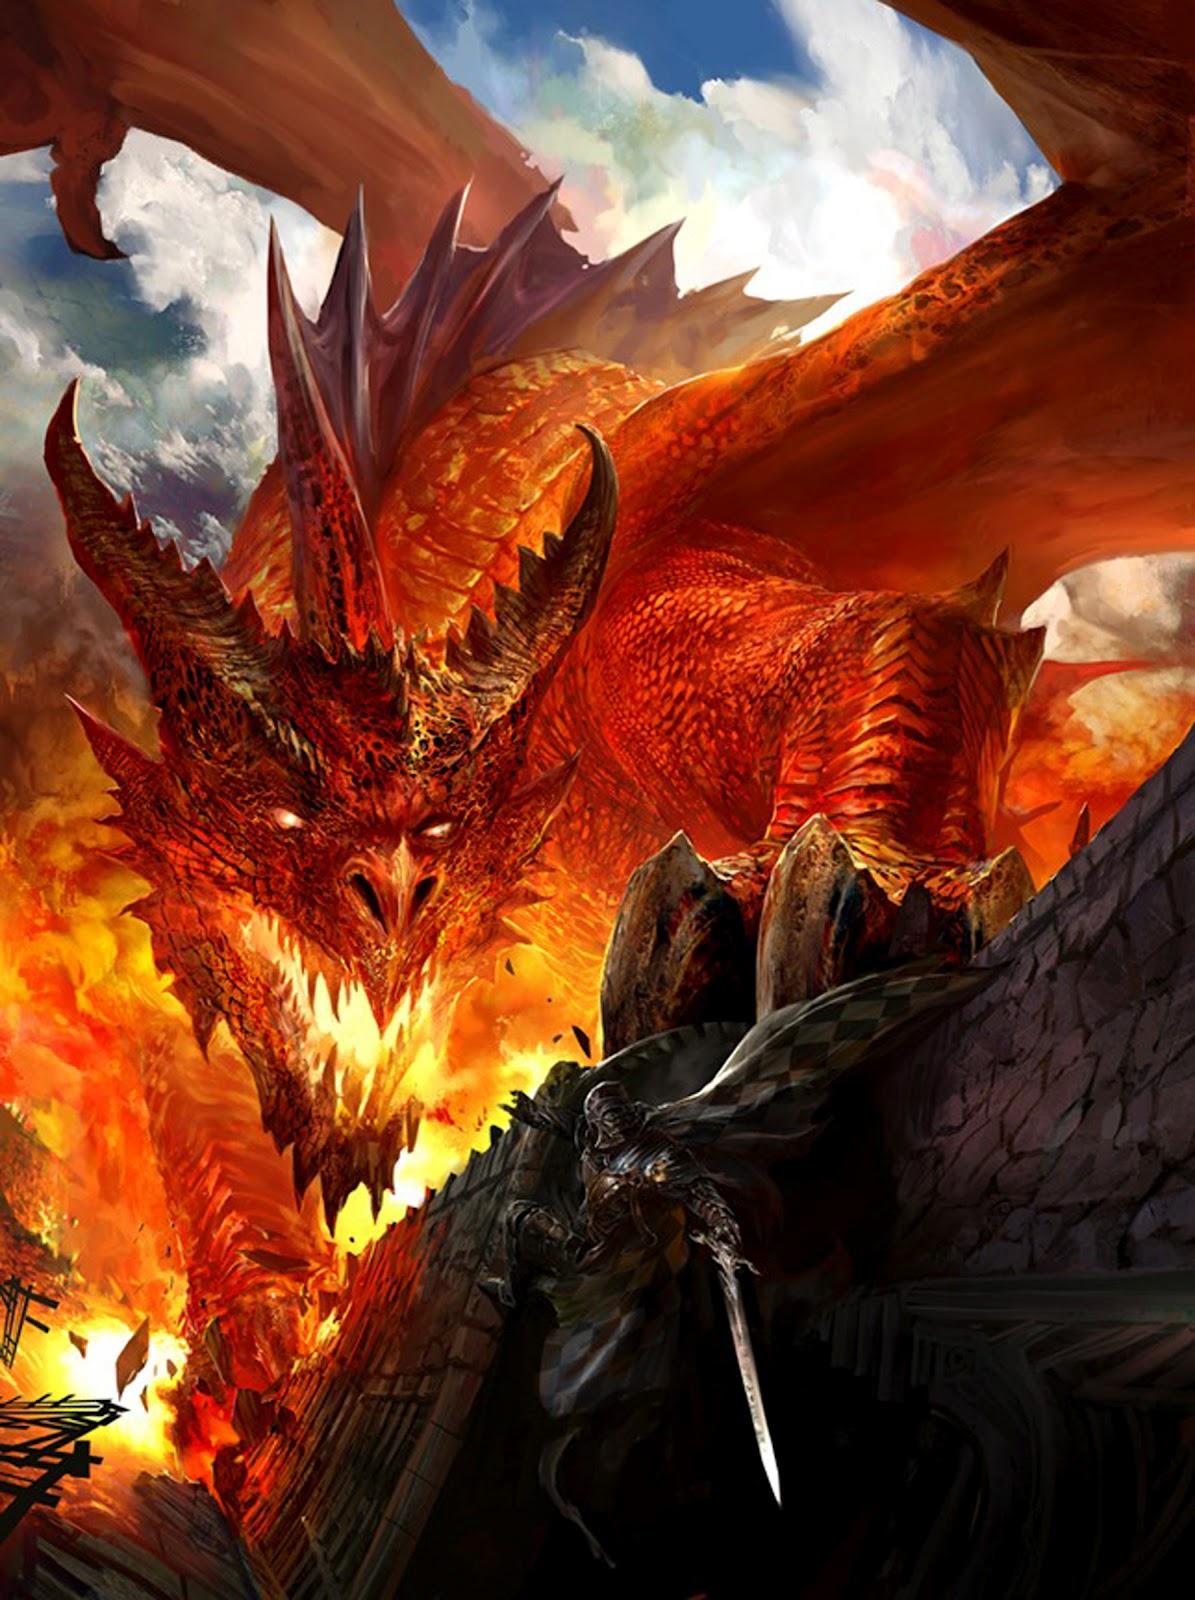 miscellaneous fire dragon picture - photo #8